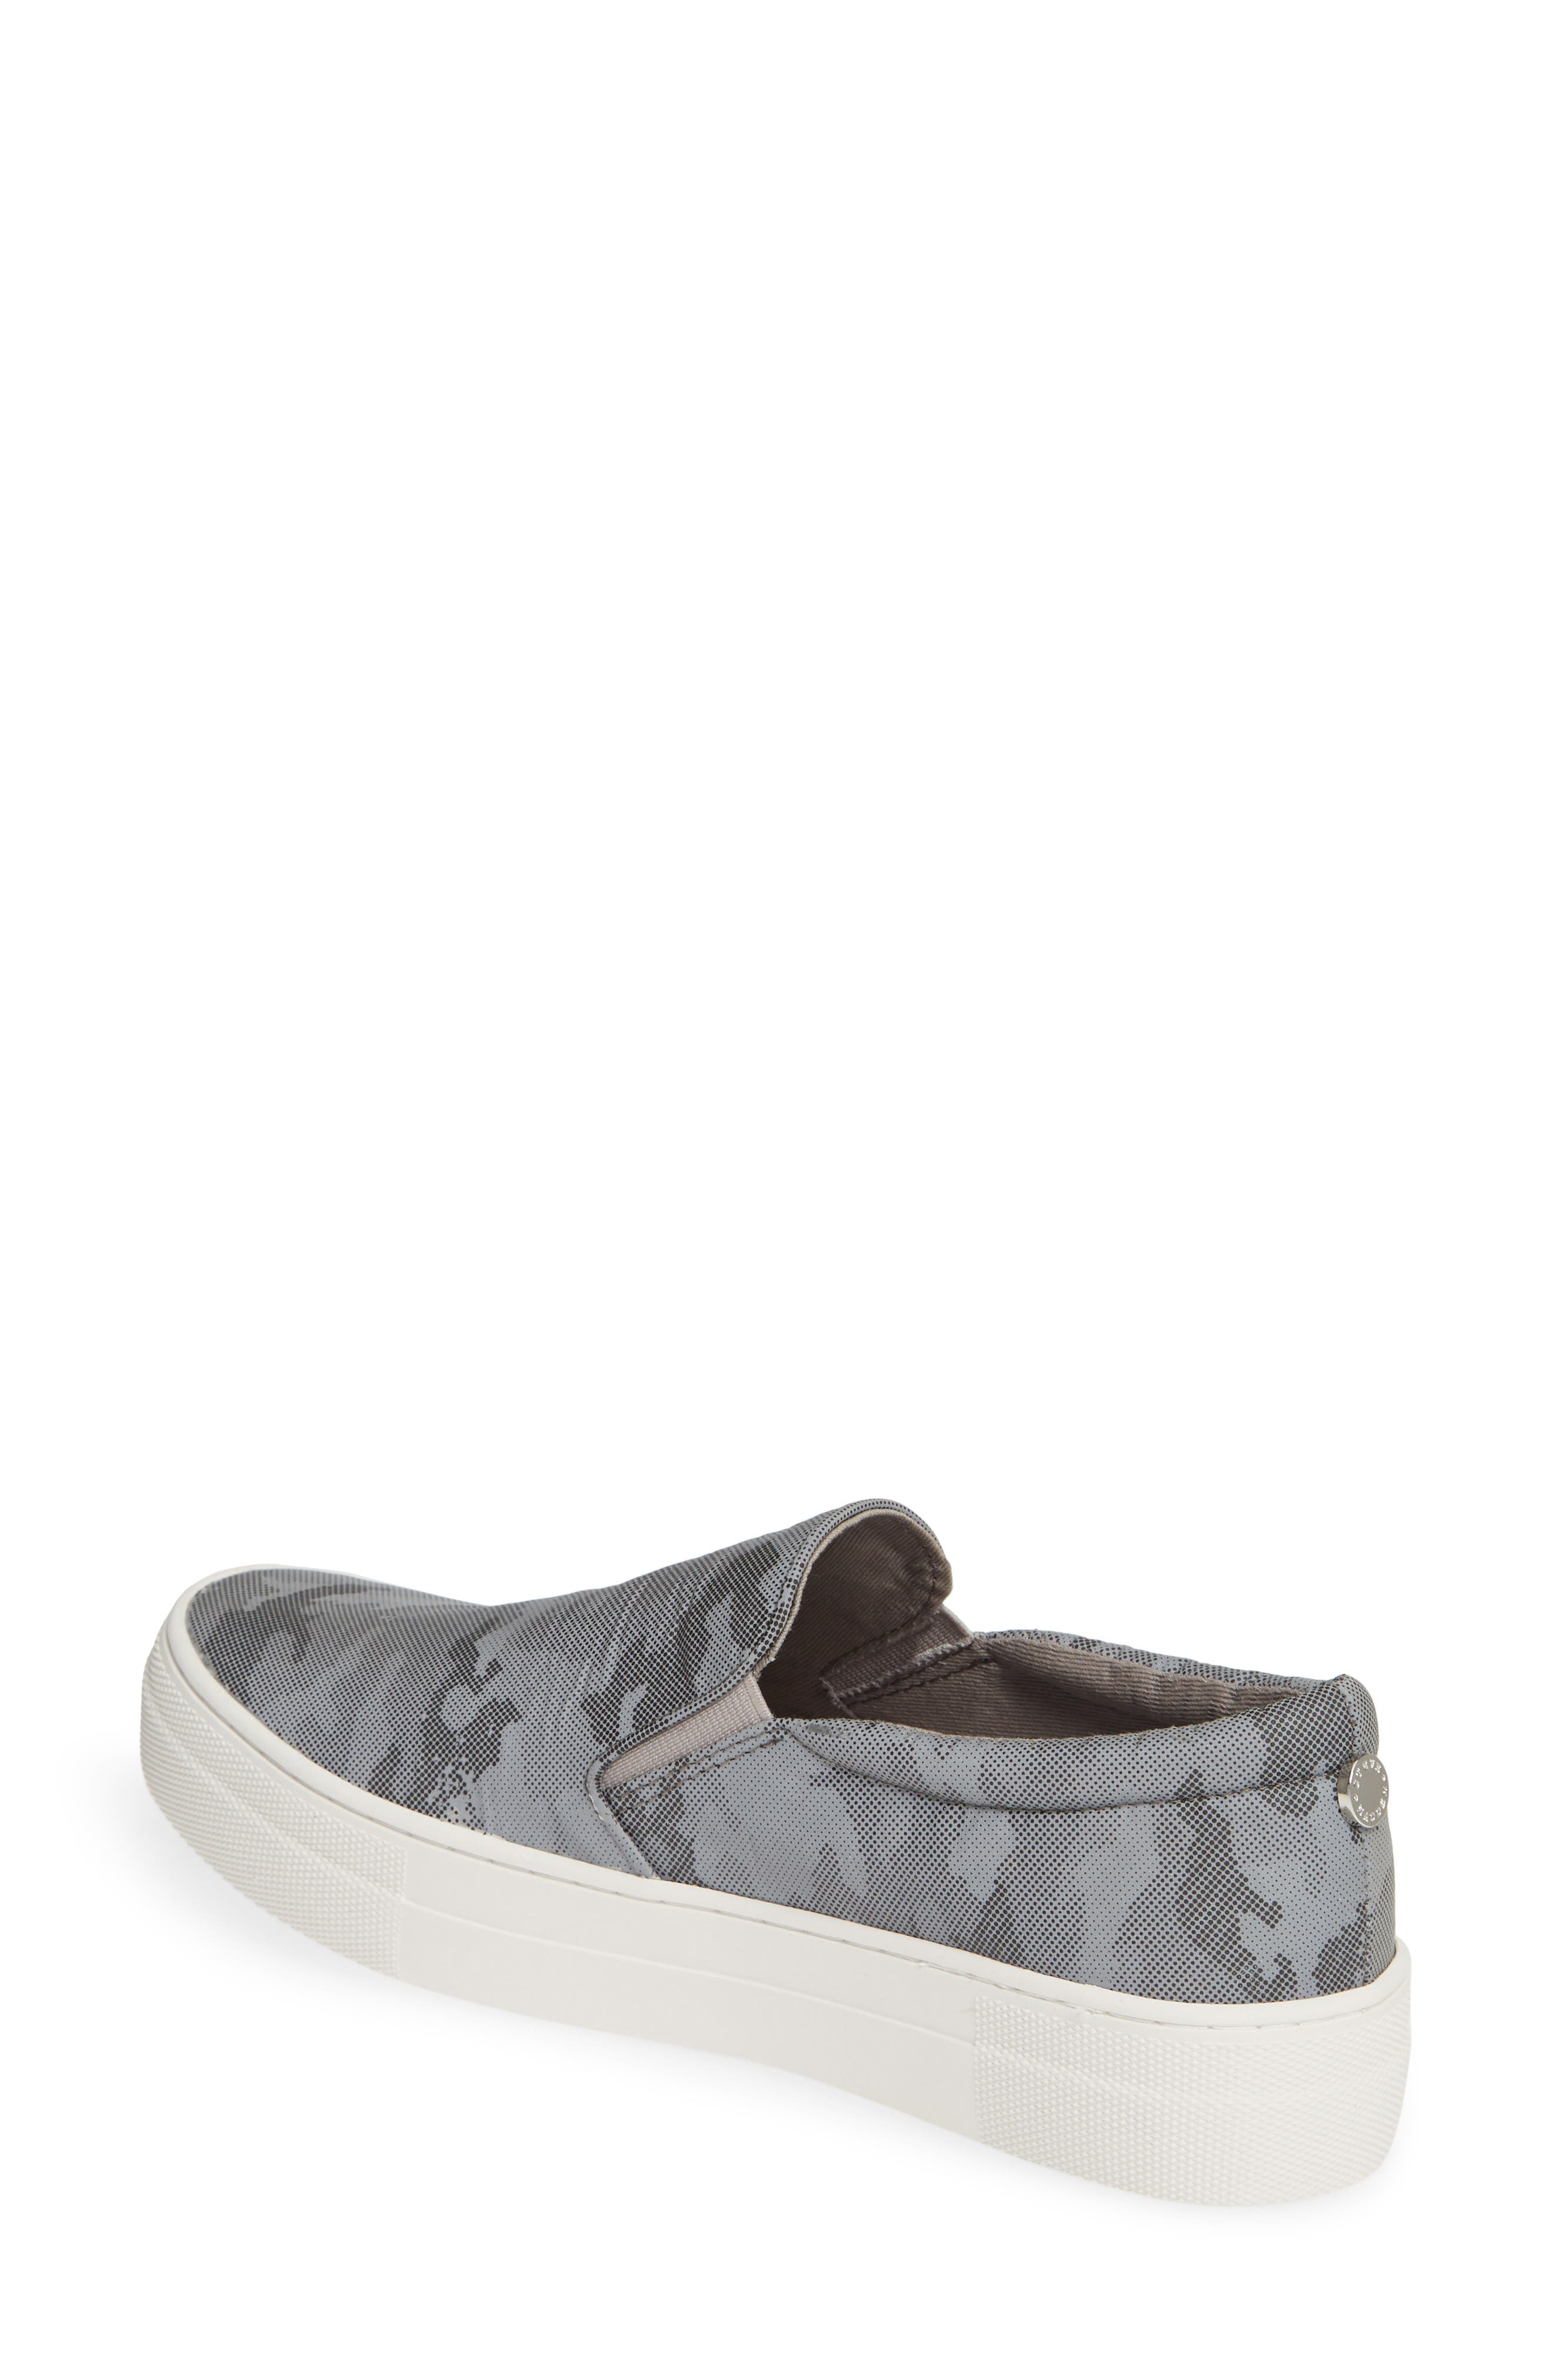 70644636e39 platform sneakers | Nordstrom